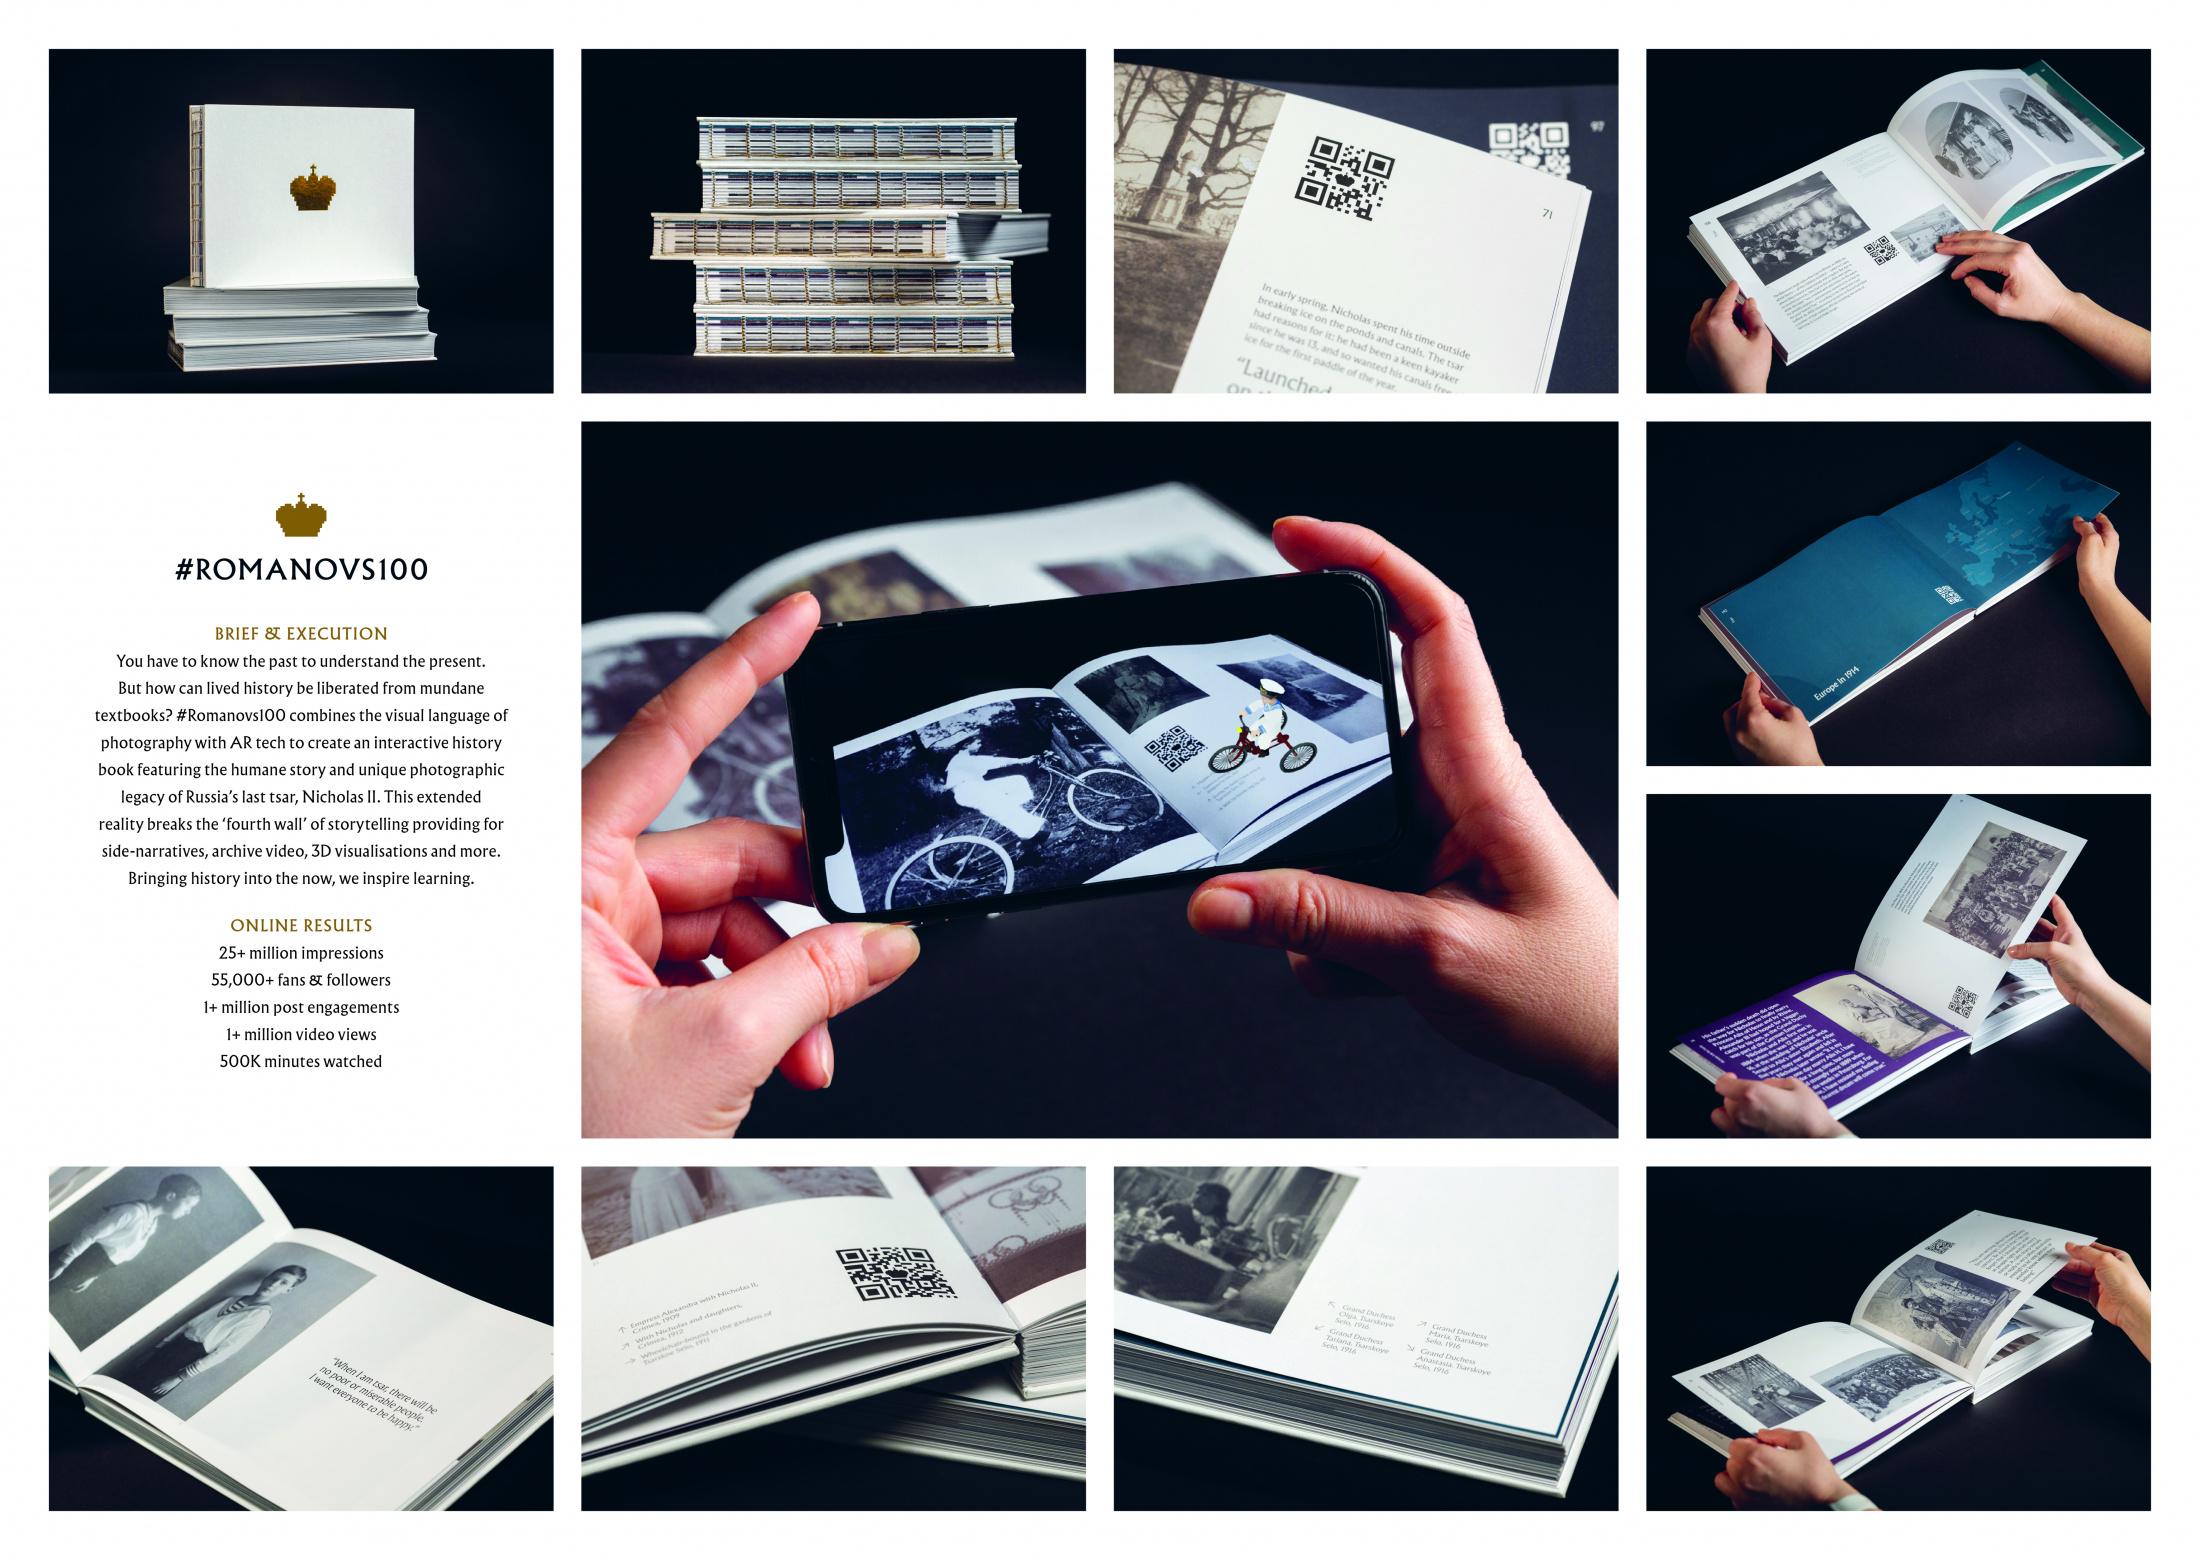 Thumbnail for #Romanovs100 AR Photo Album